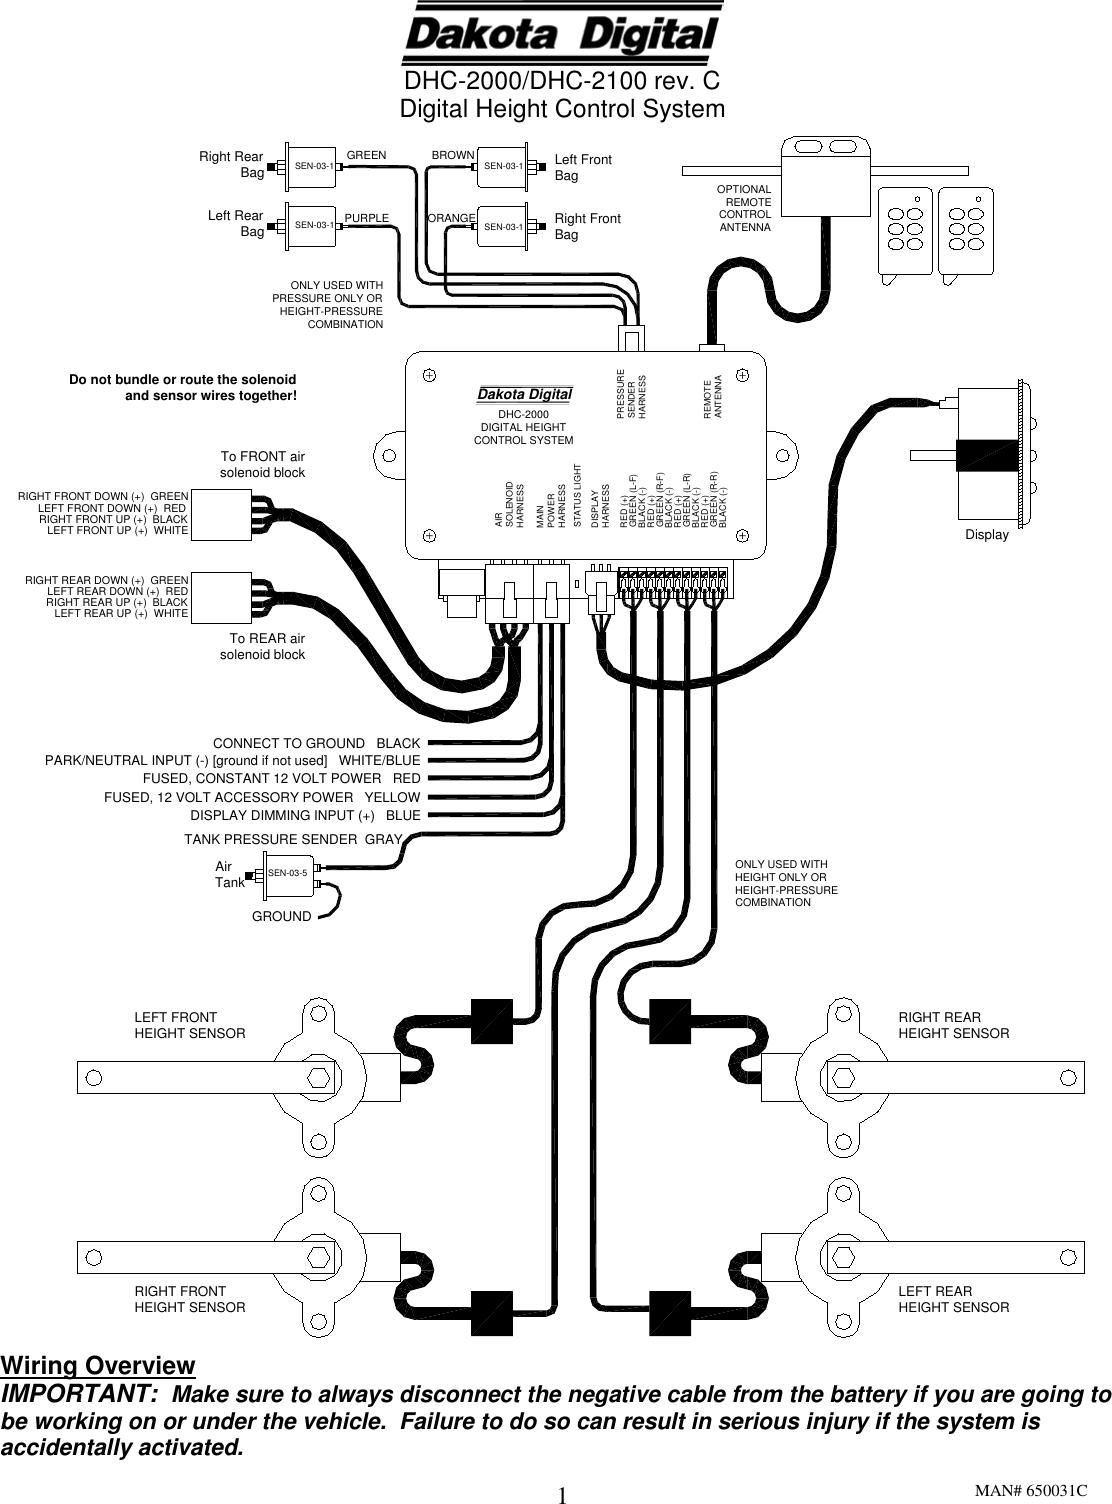 Dakota Digital Dhc 2000 Users Manual on